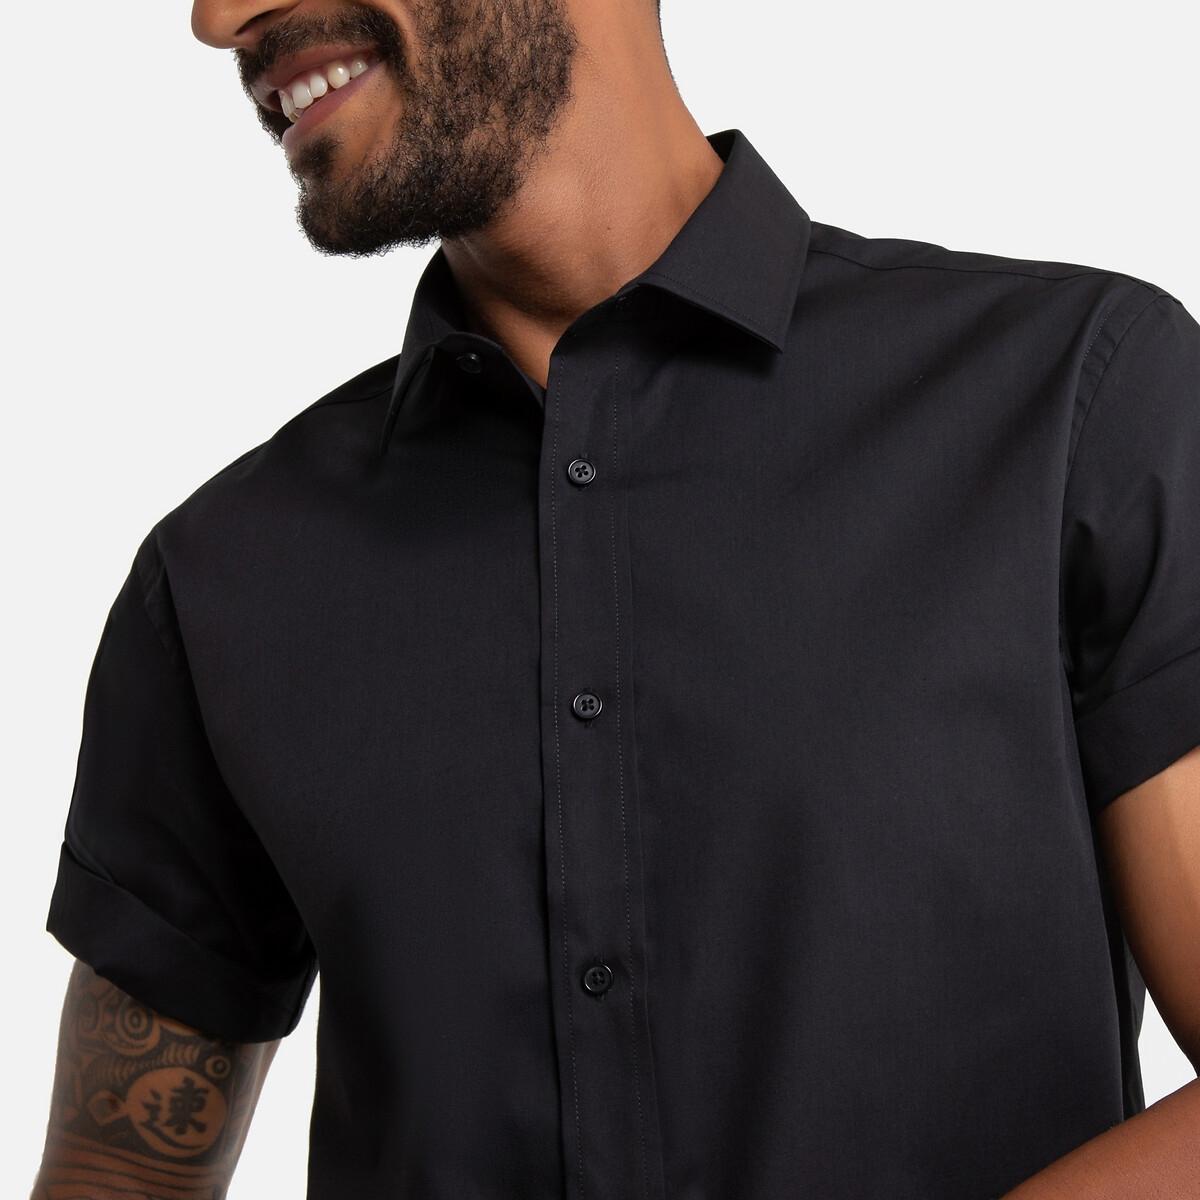 Фото - Рубашка LaRedoute Прямого покроя 39/40 черный юбка laredoute джинсовая прямого покроя xs синий